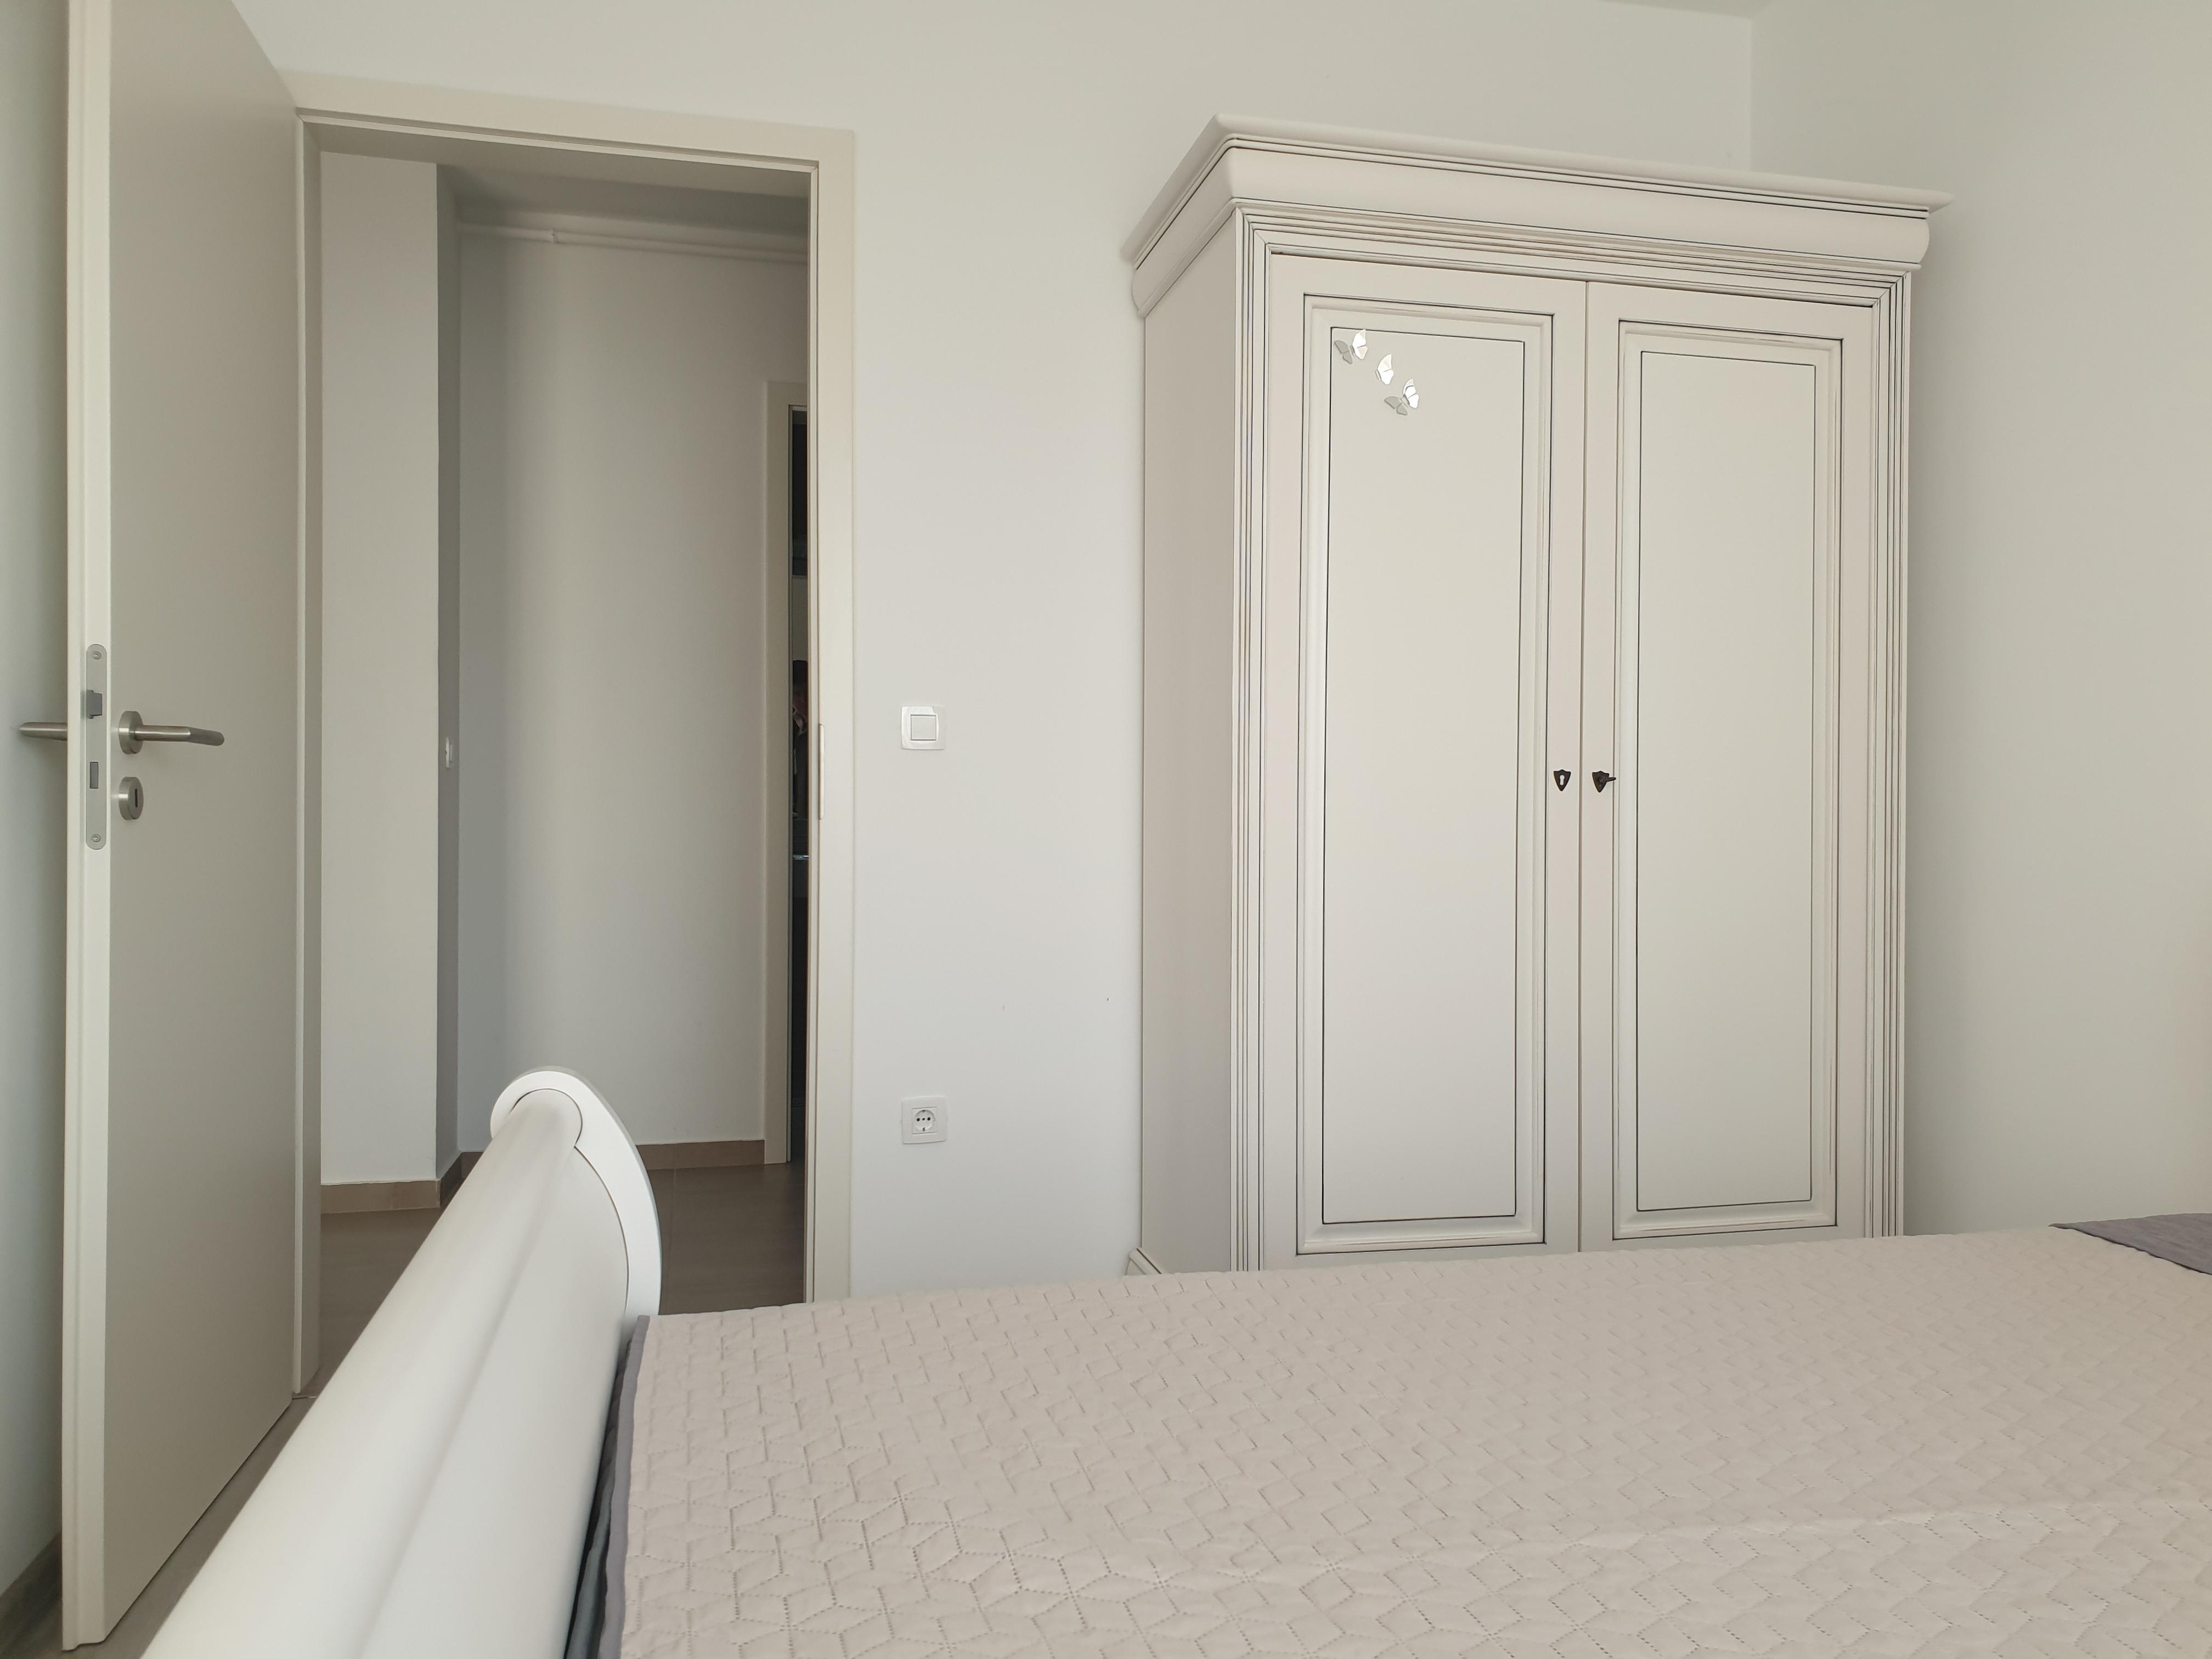 Apartament de inchiriat Avantgarden Coresi